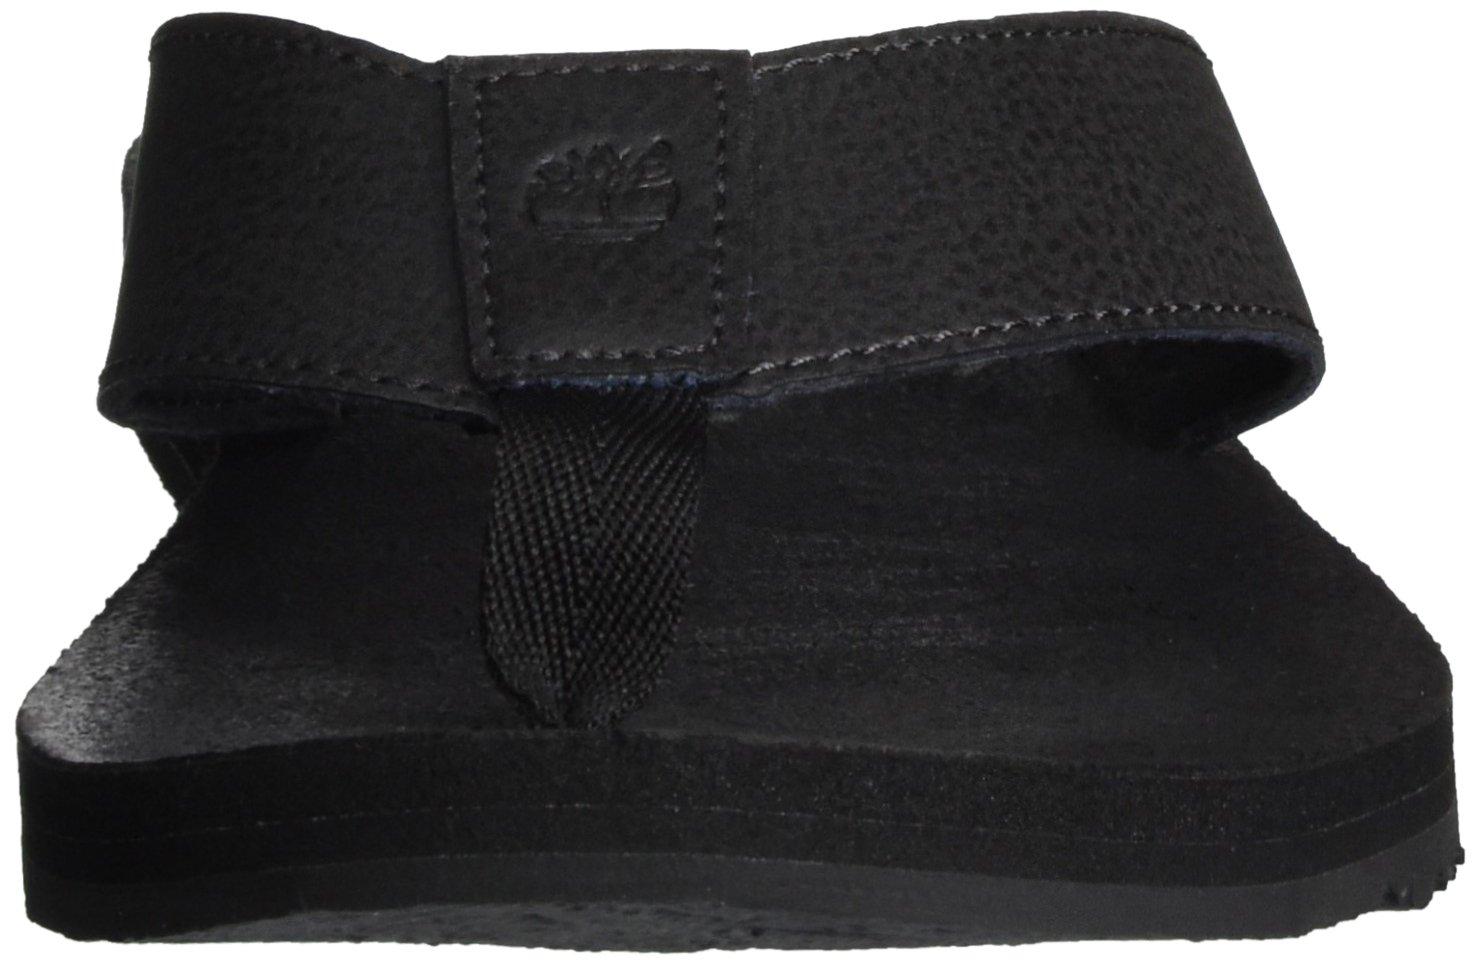 26f7efe1ff Timberland (Black Wild Lthr Dunes Lthr Flipflopblack Madras Enhanced  Leather